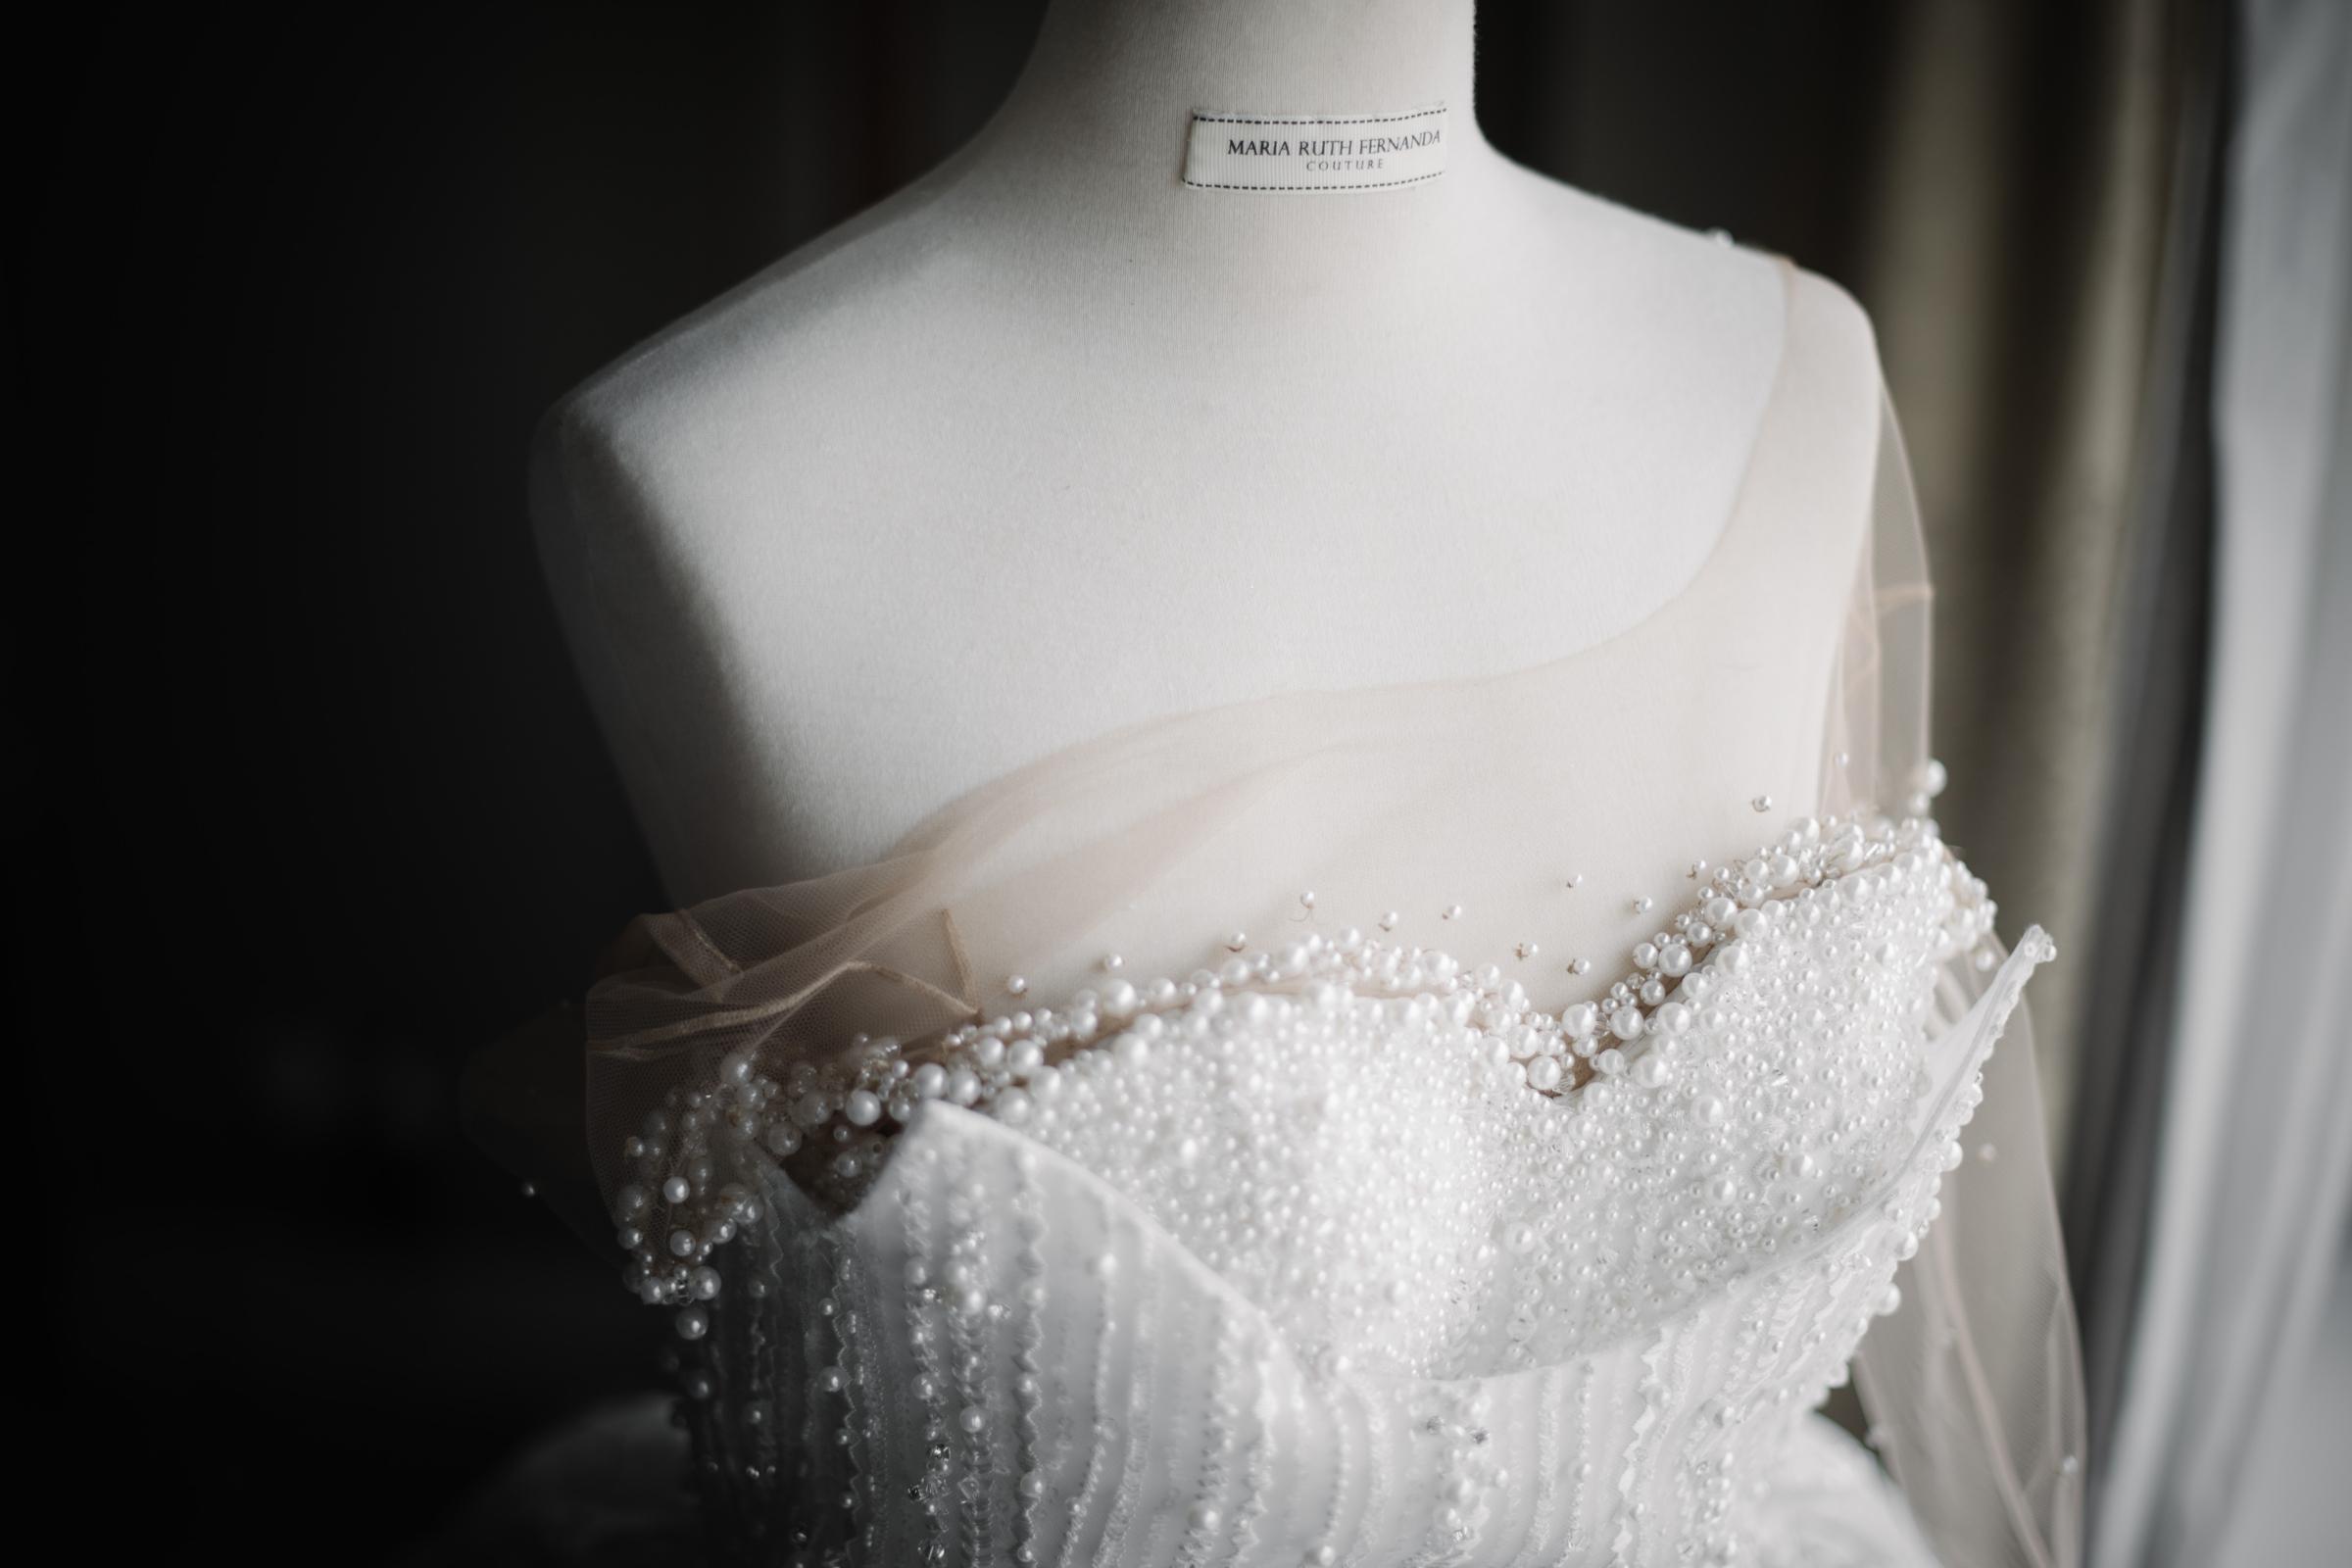 livia-reagan-wedding-raffles-jakarta-pyara-photo-gejoo 4.jpg